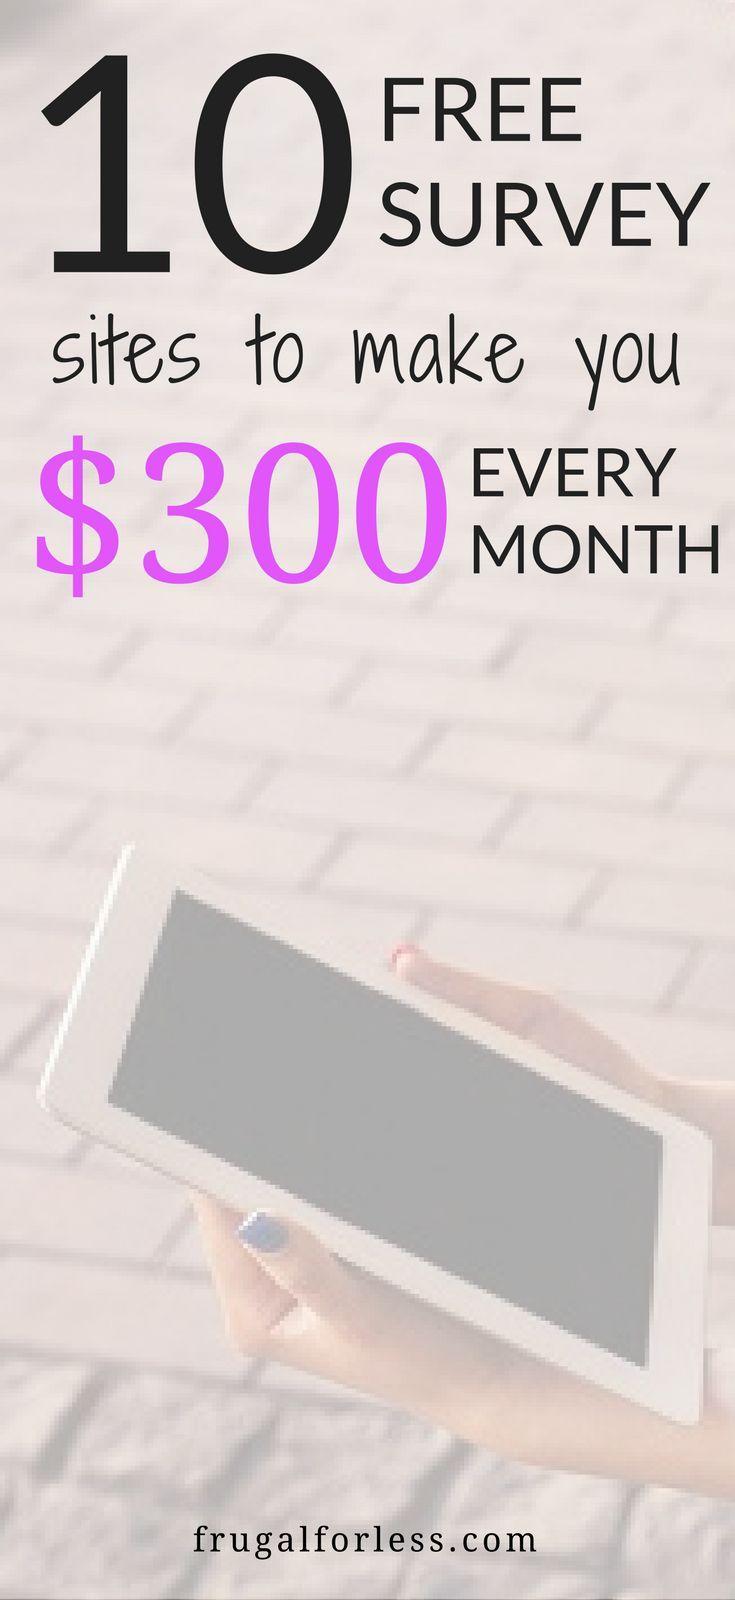 Make Money Online | Survey Sites That Pay | Work From Home | Work From Home Jobs | Surveys For Money